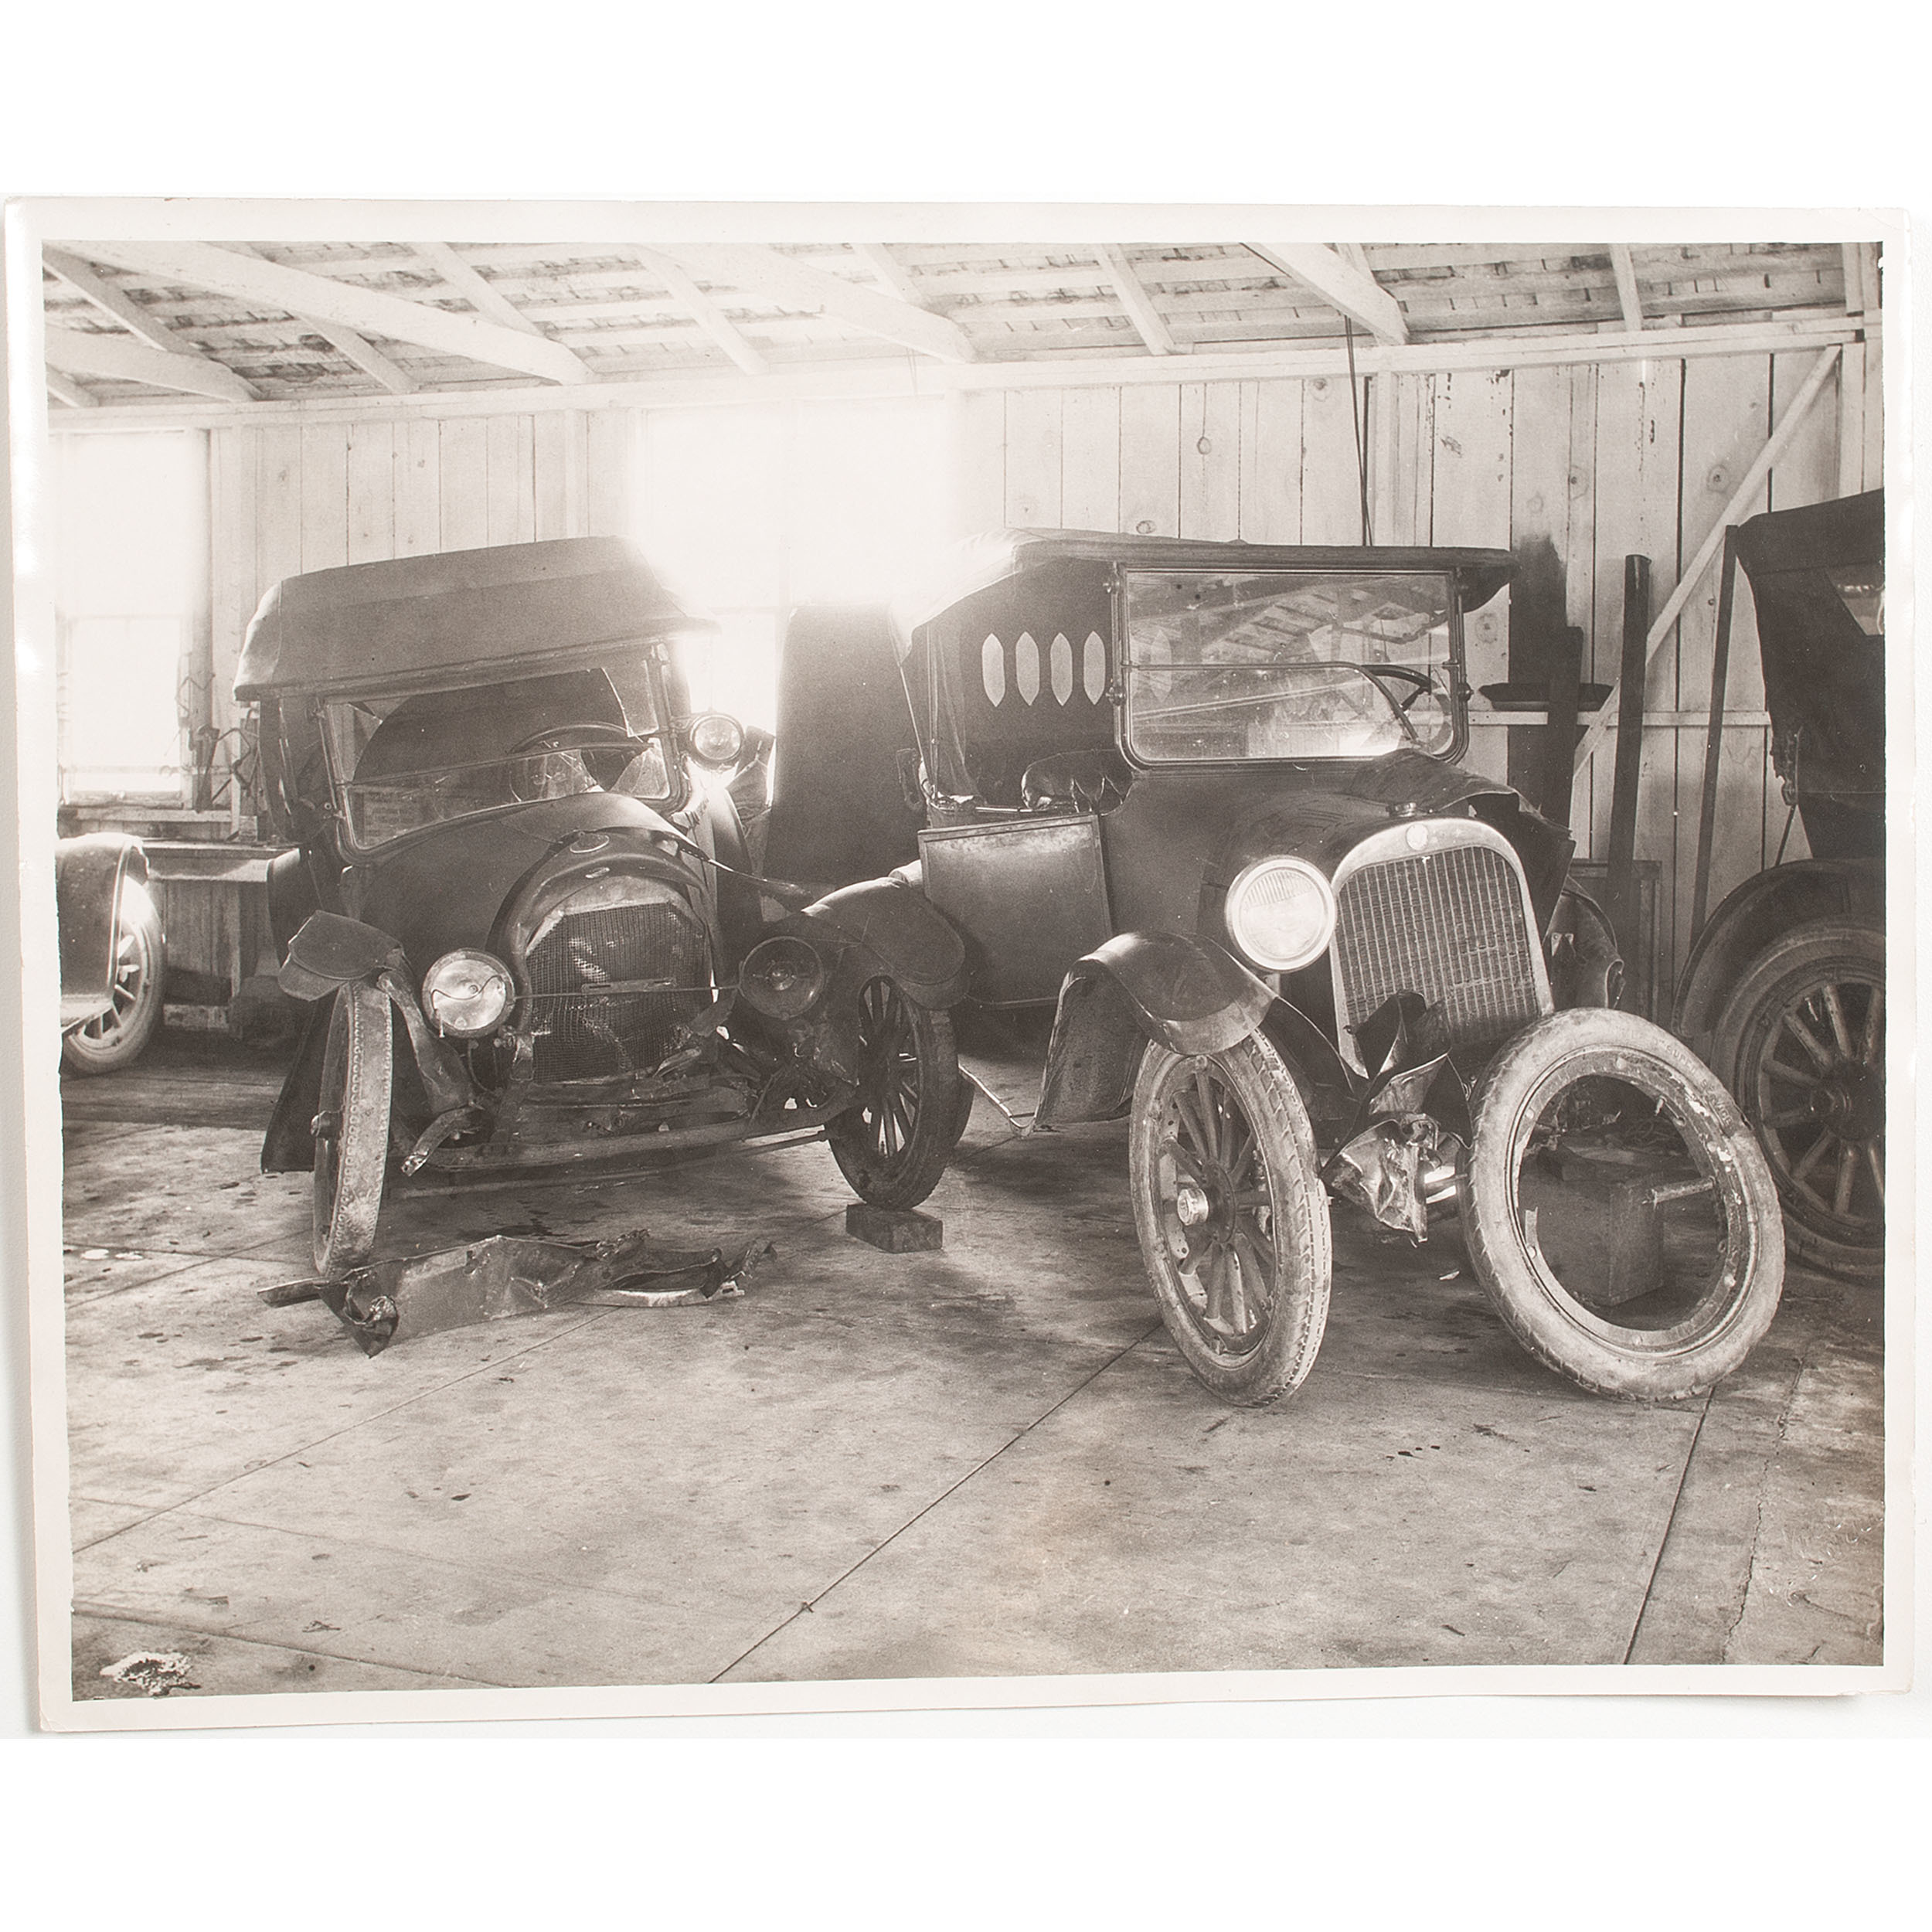 Photographs Of Car Repair Shop Interiors